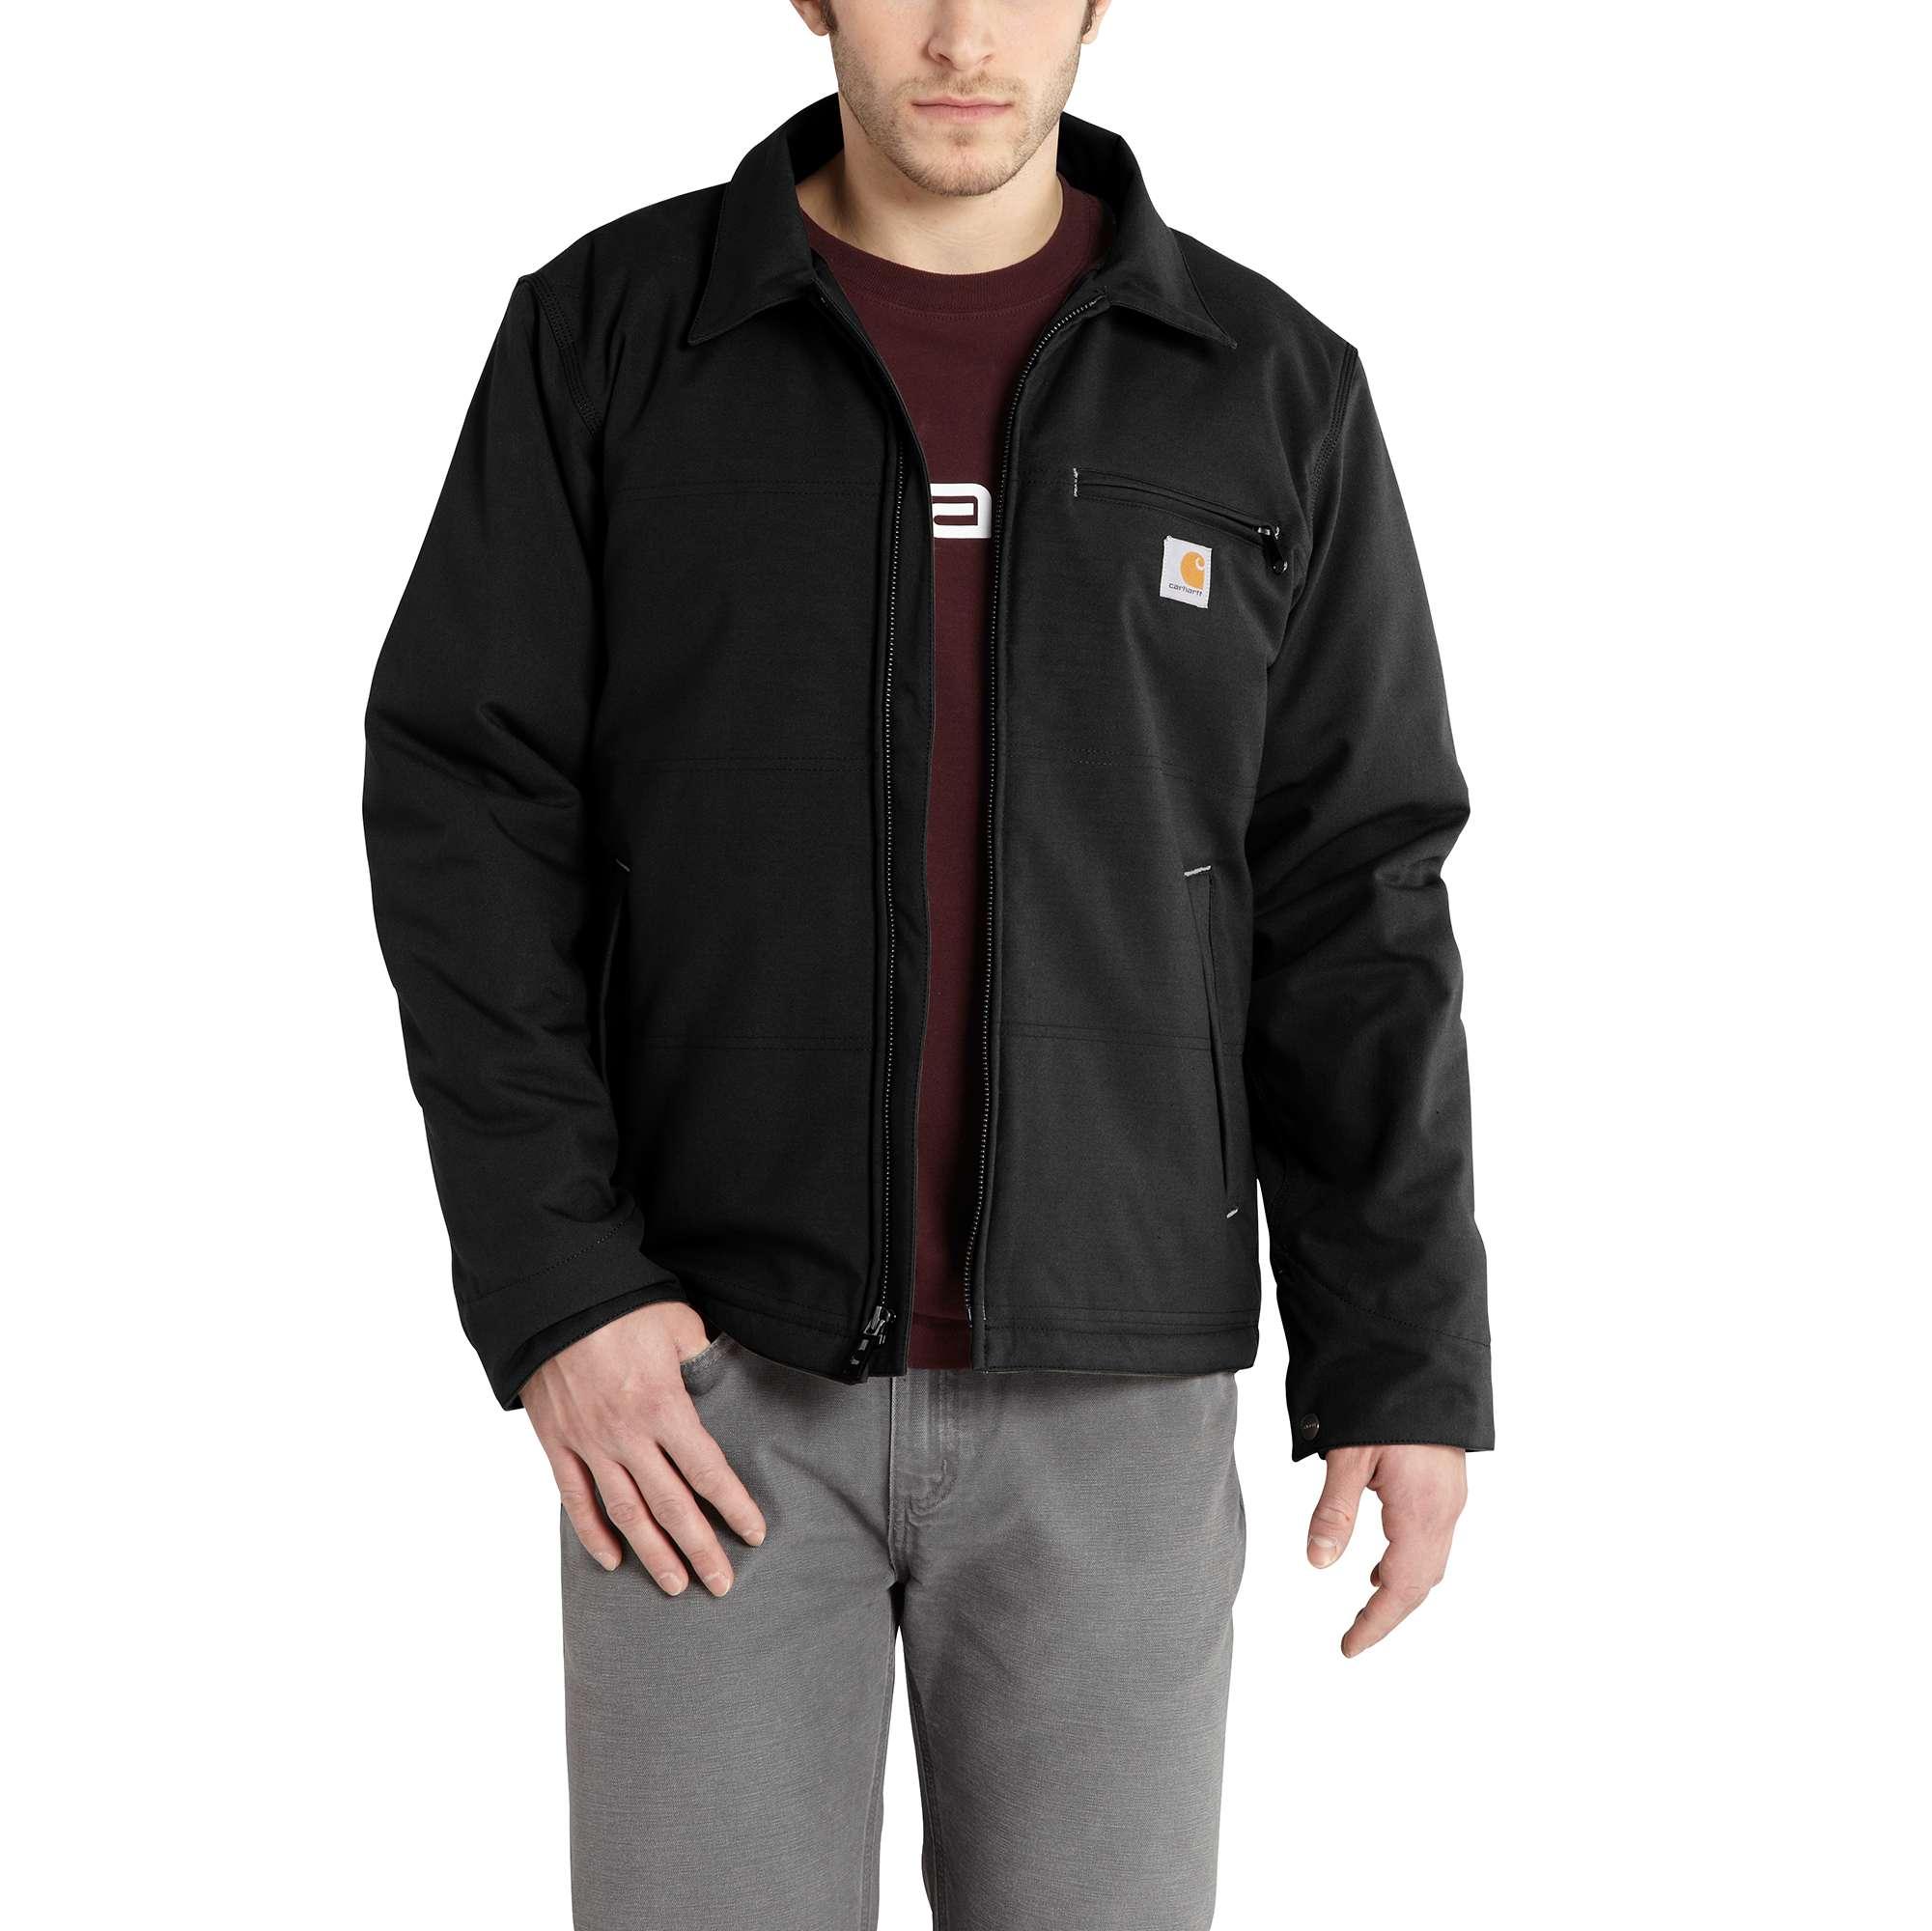 Carhartt Men S Jackets Carhartt Jackets And Coats Online